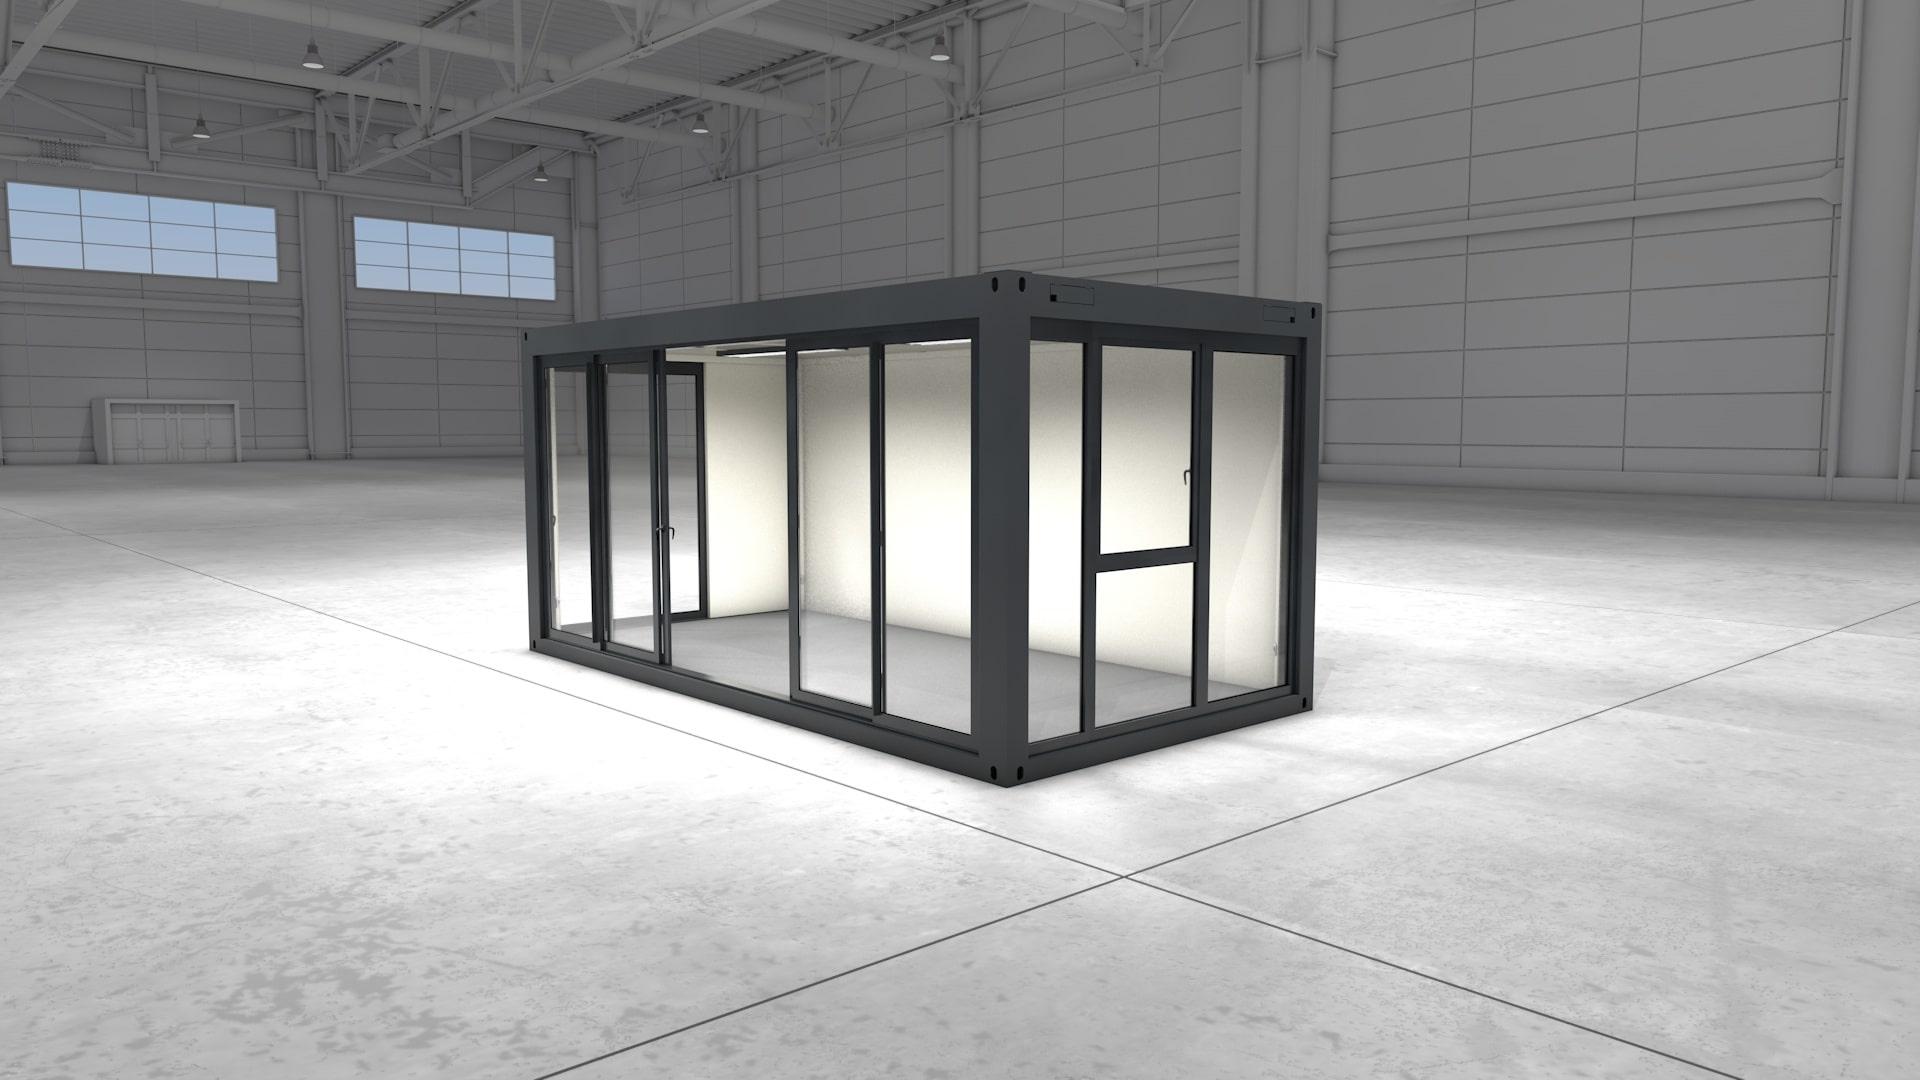 Container Modul 2 - Ansicht 2